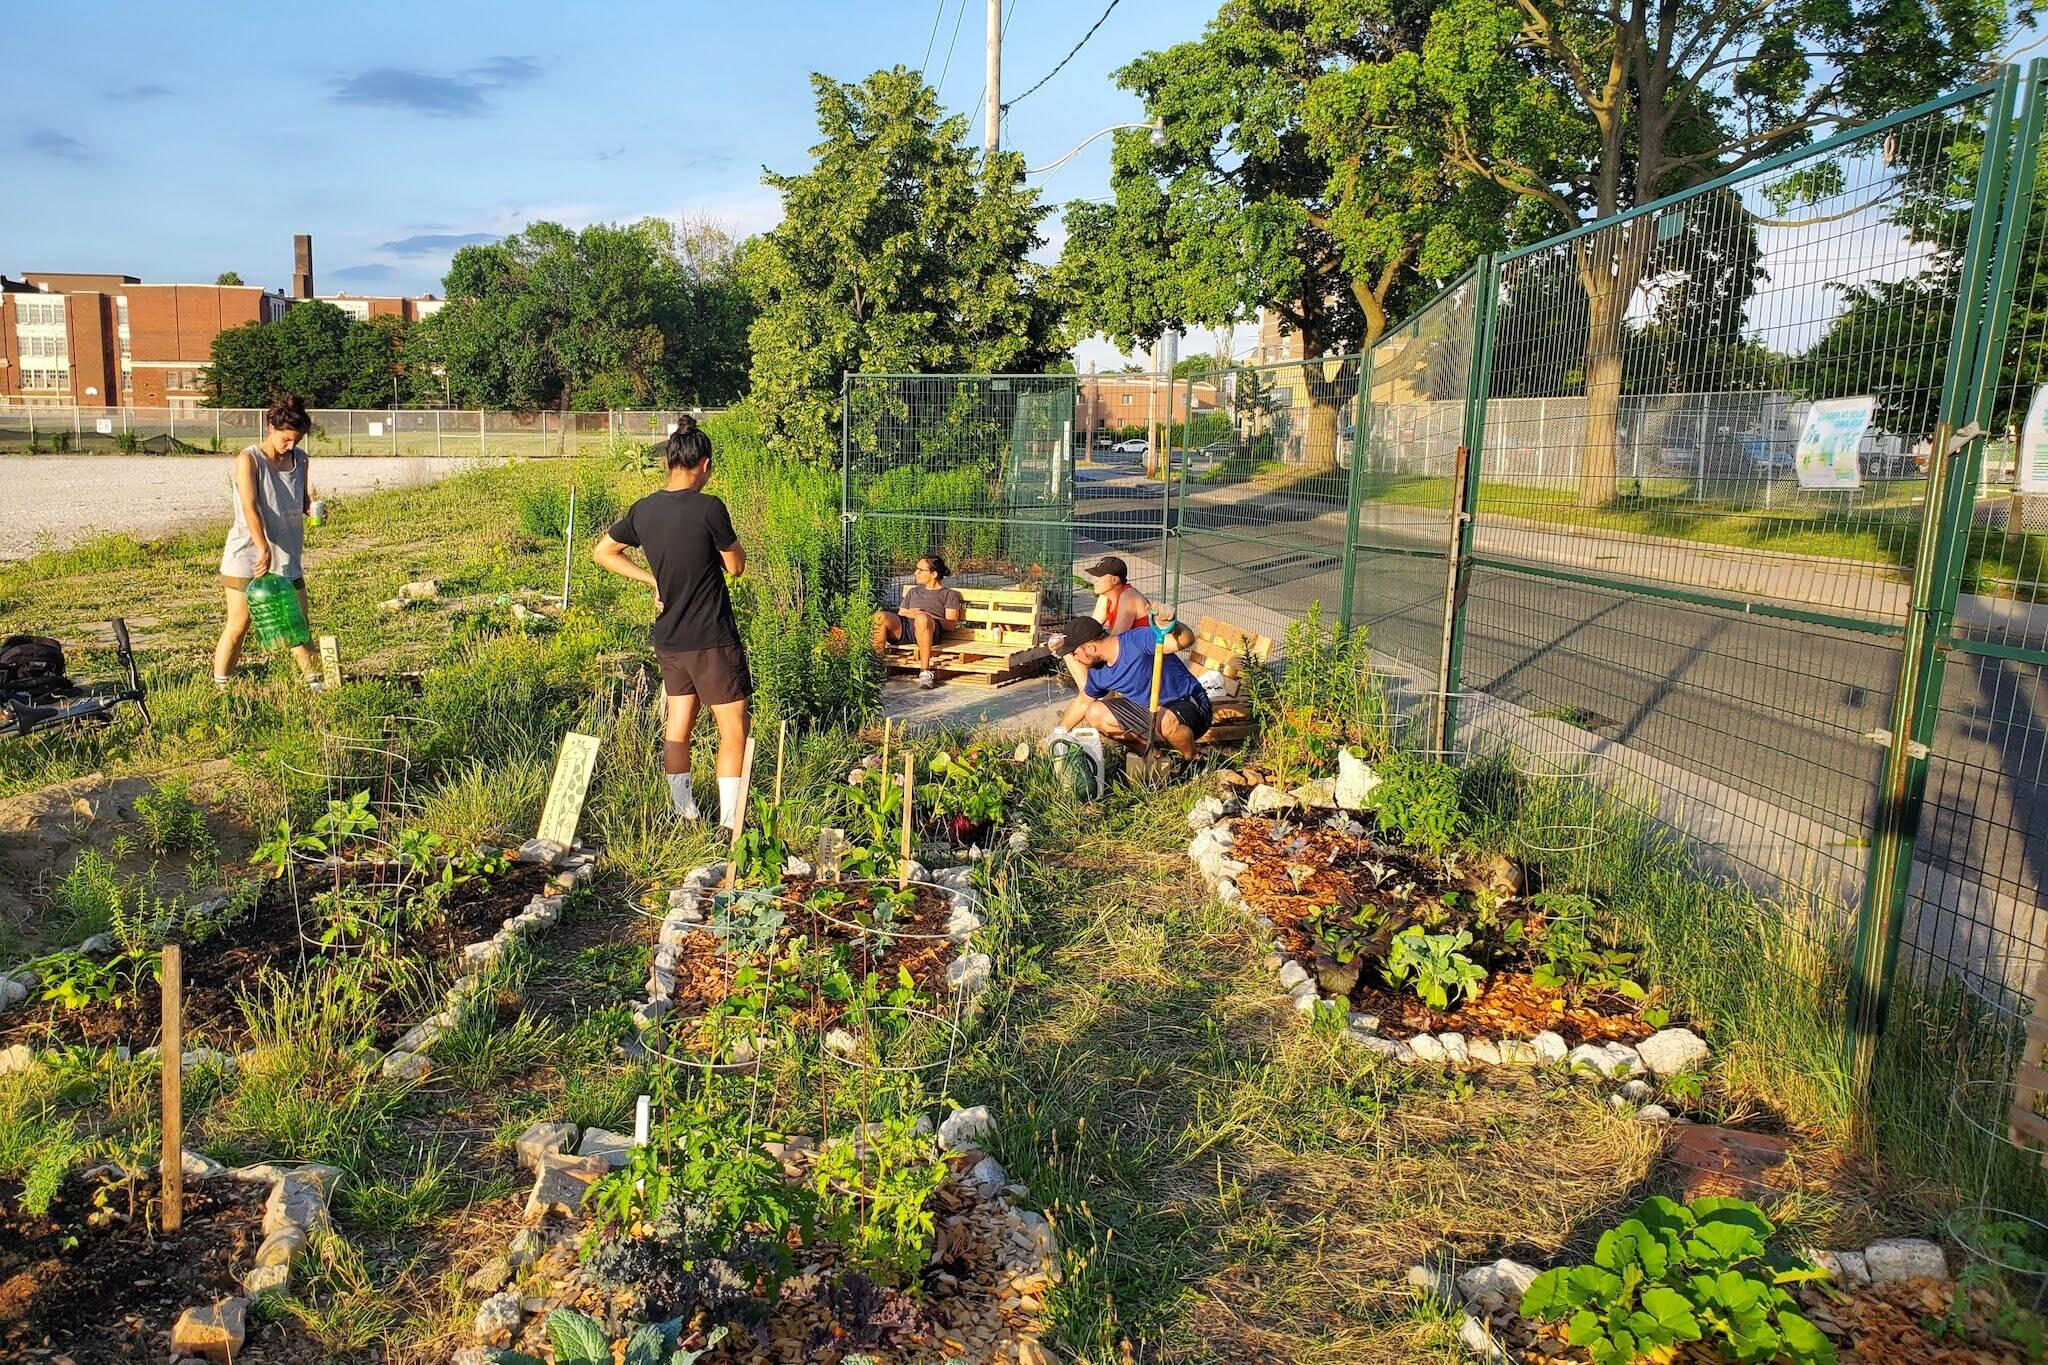 bloordale beach community gardens toronto